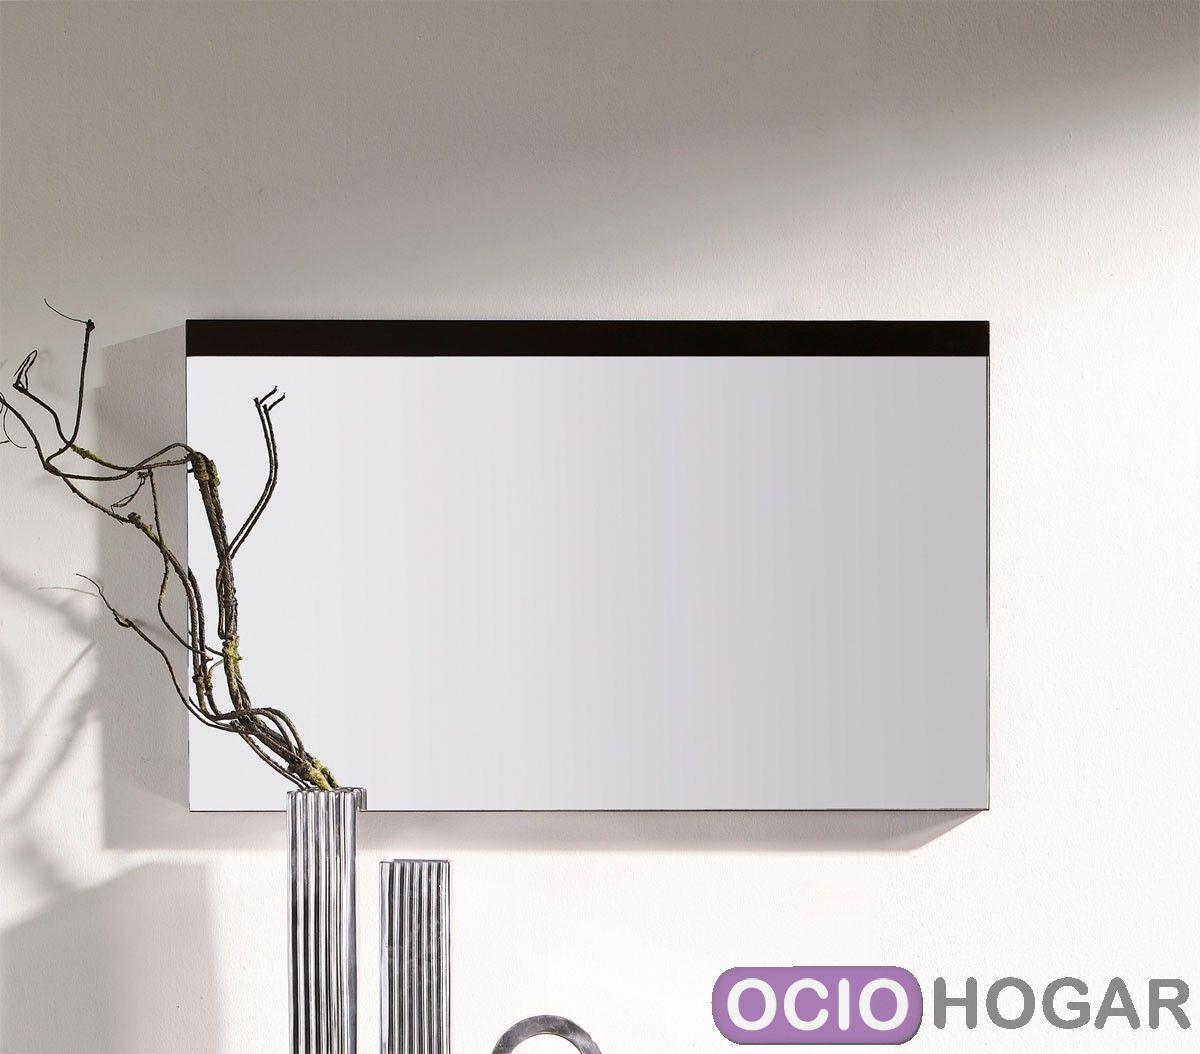 Espejo de dise o coimbra de dissery complementos en for Espejos horizontales para comedor